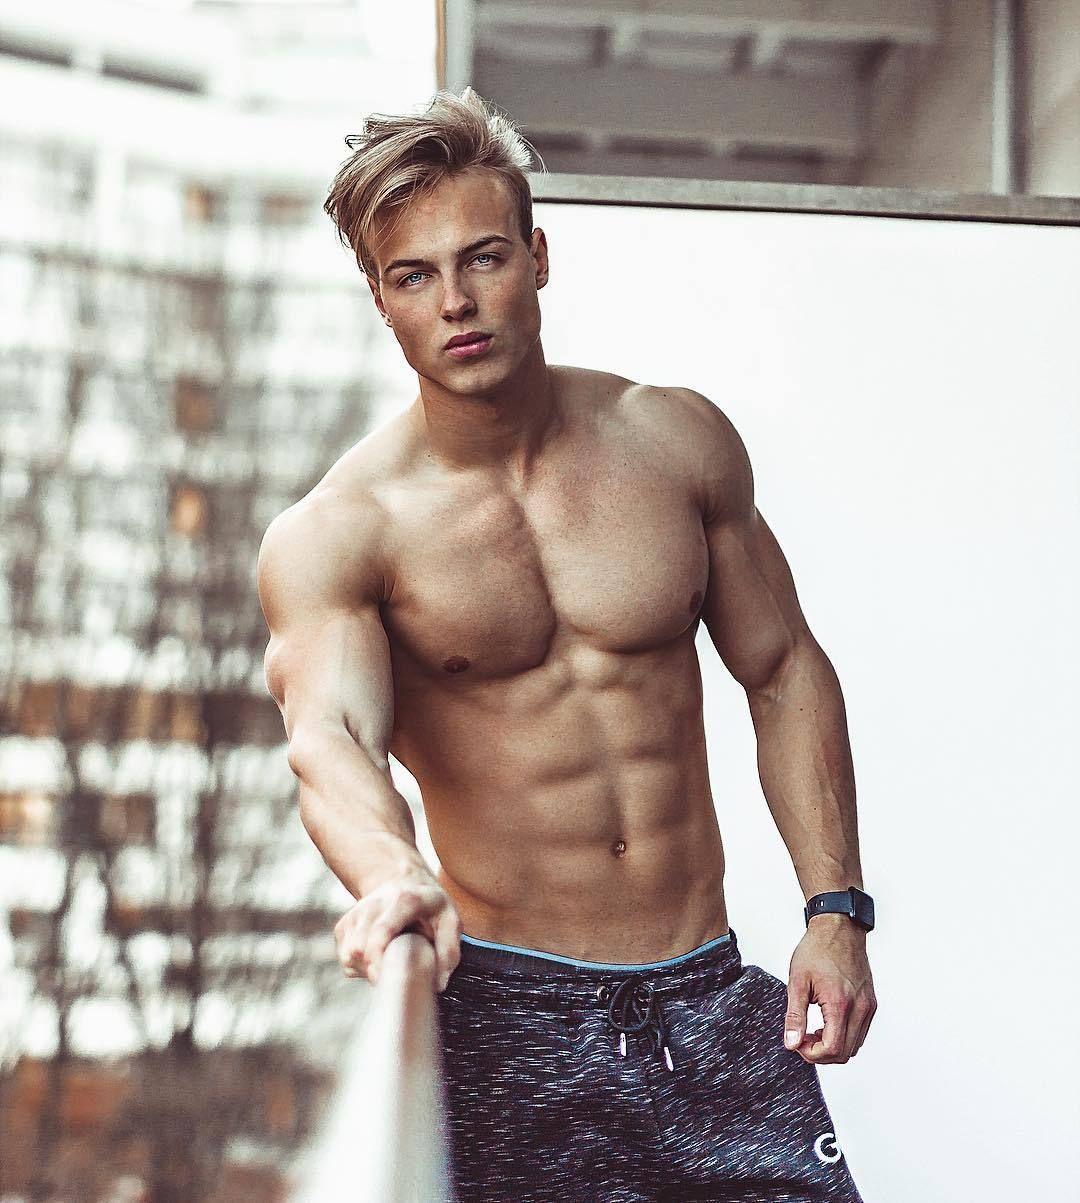 Professional Male Models Hagen Richter Who Is Ready For Summer Body Vorstellen Instagram